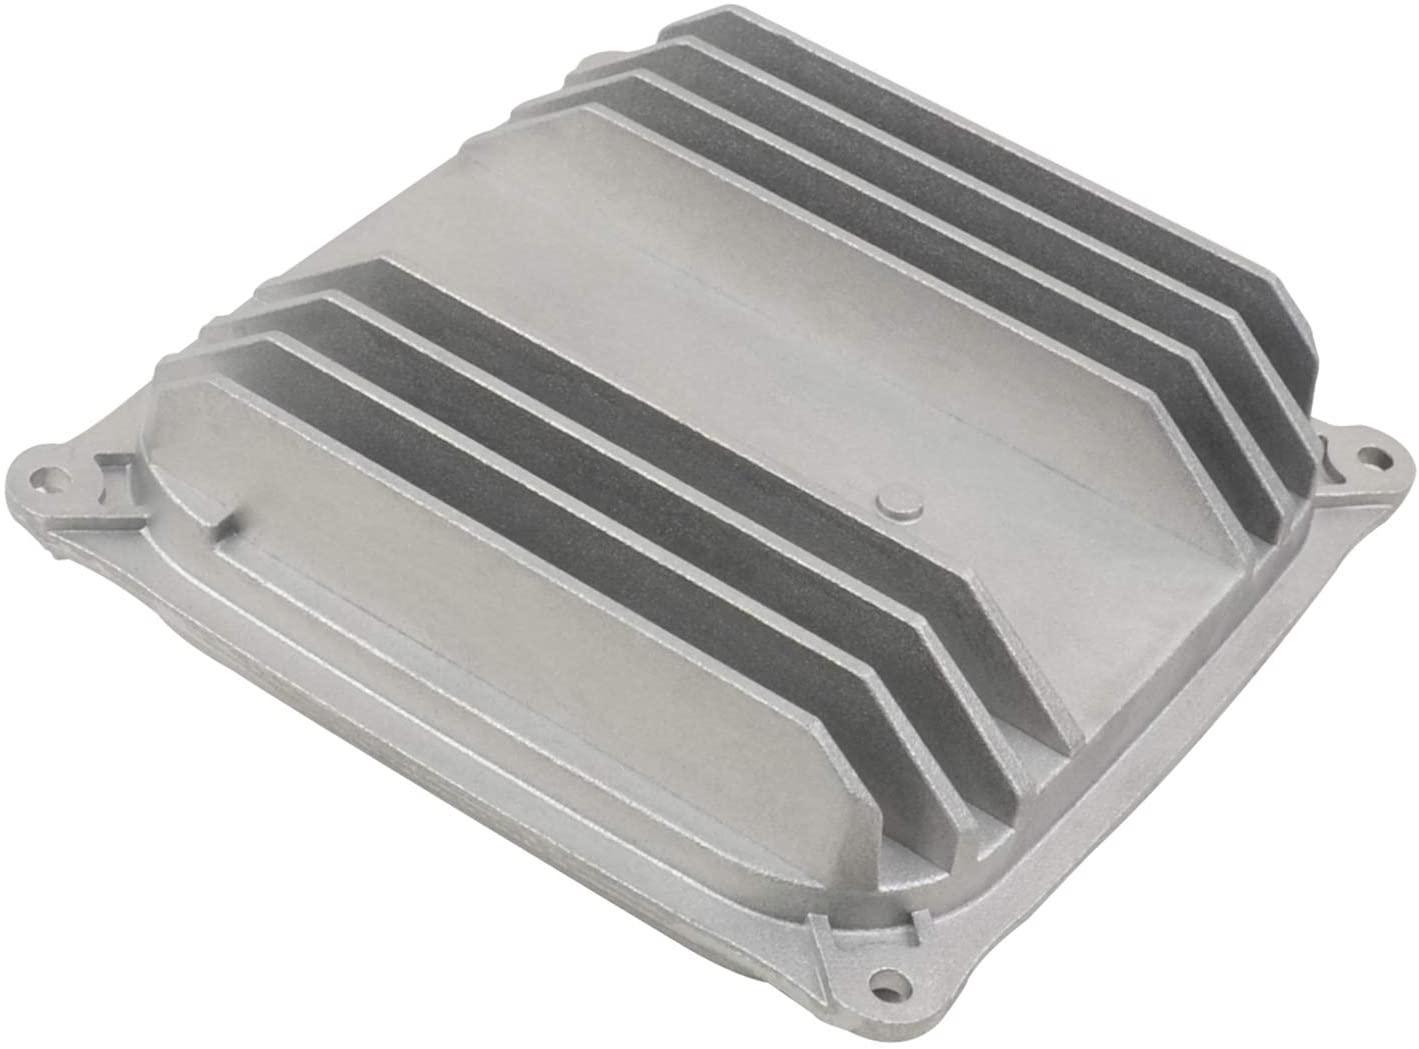 LED Headlamp Control Module 2189009203 for Mercedes-Benz GL ML SL CLS-CLASS ML350 W166 C218 2011-2015, 2189009700, 1668203689